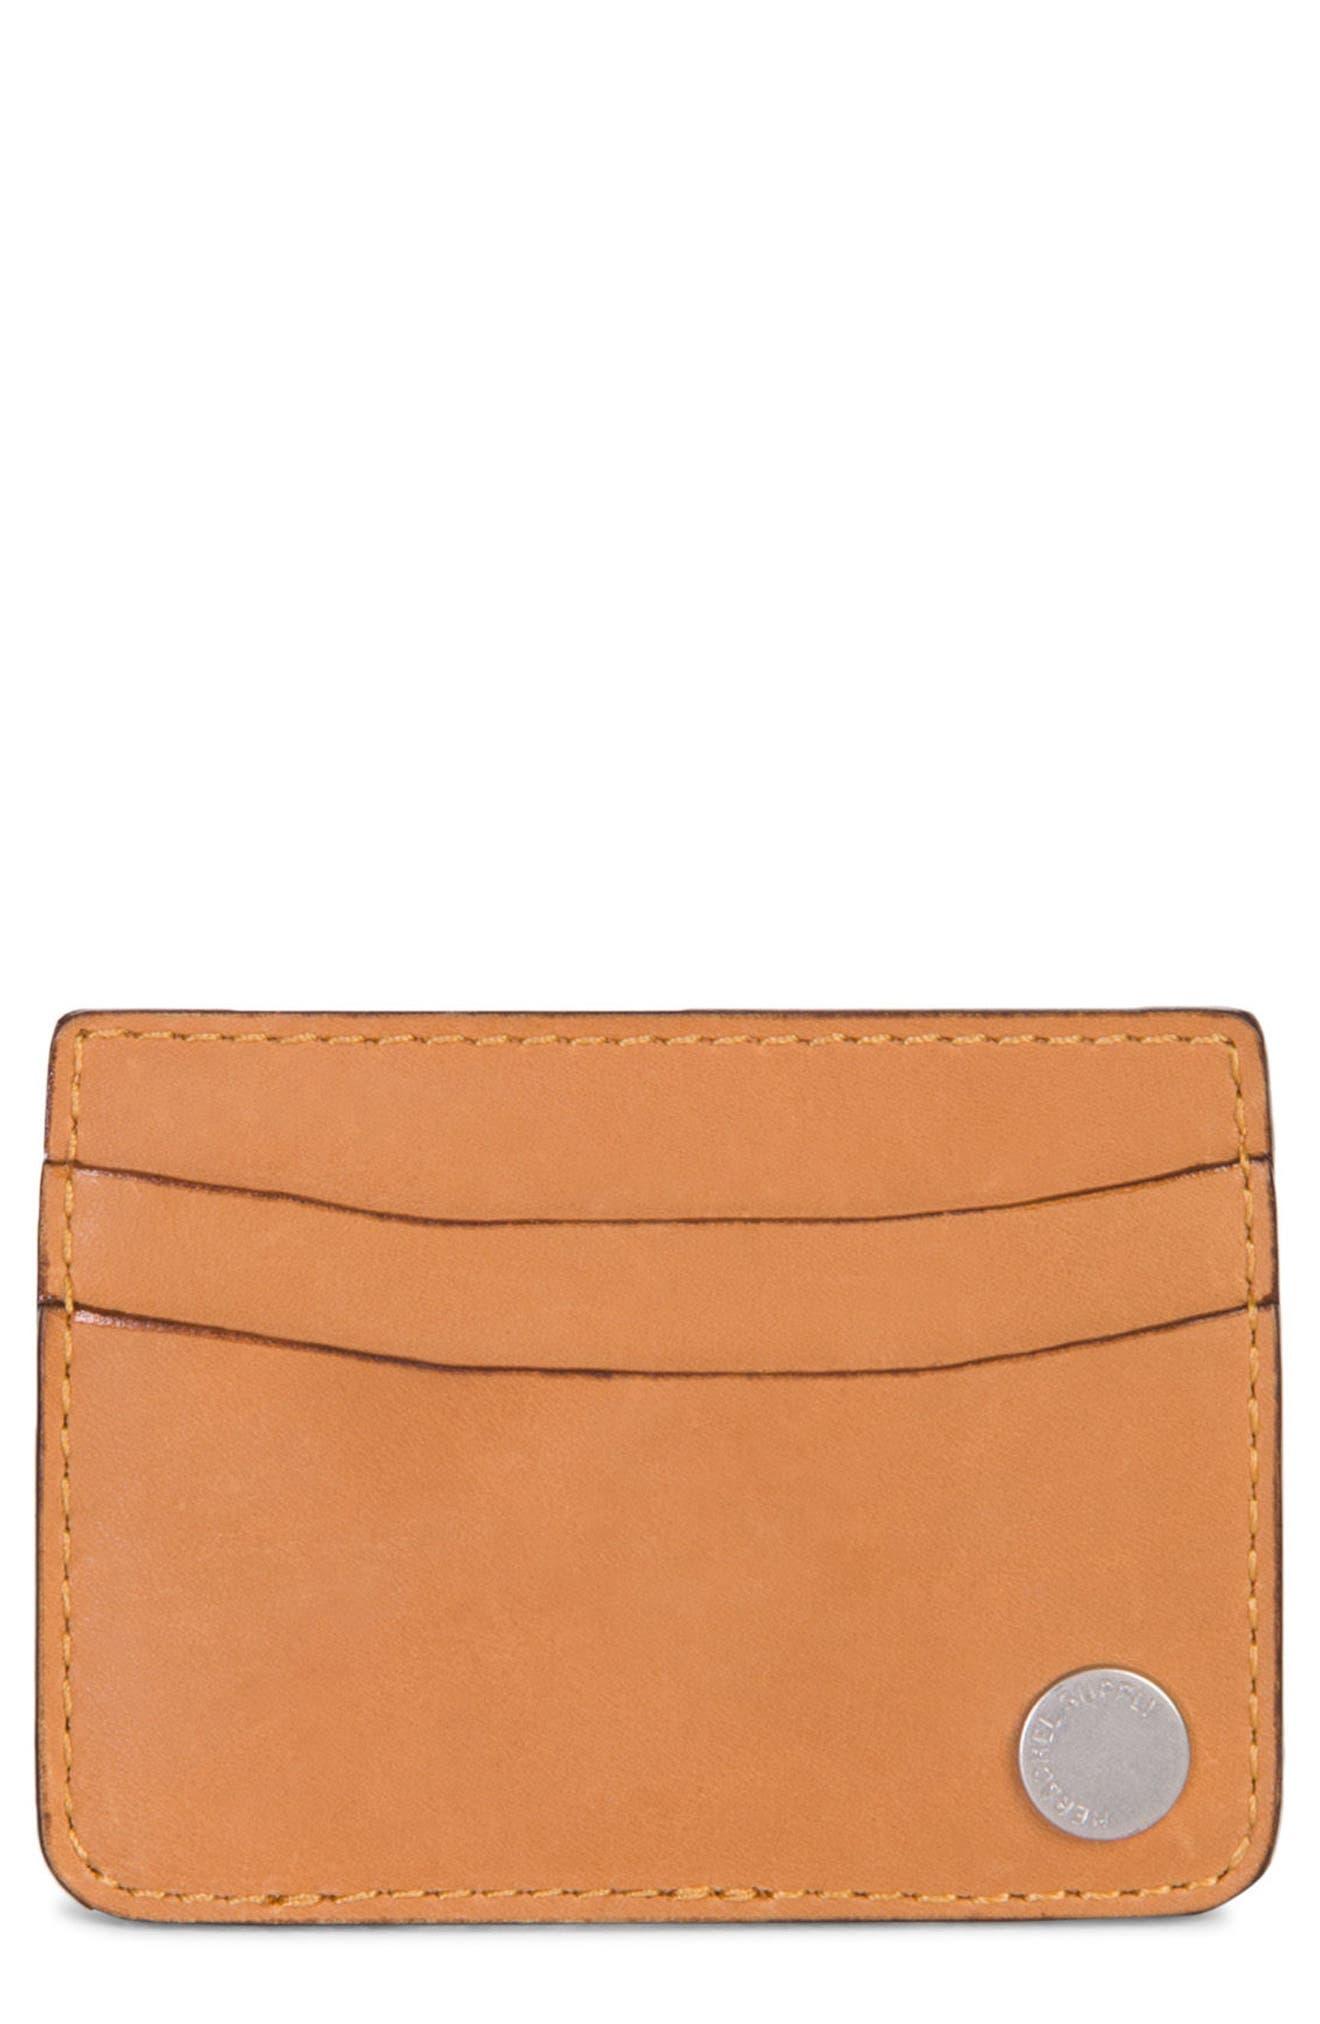 Ace Leather Card Case,                         Main,                         color, Tan